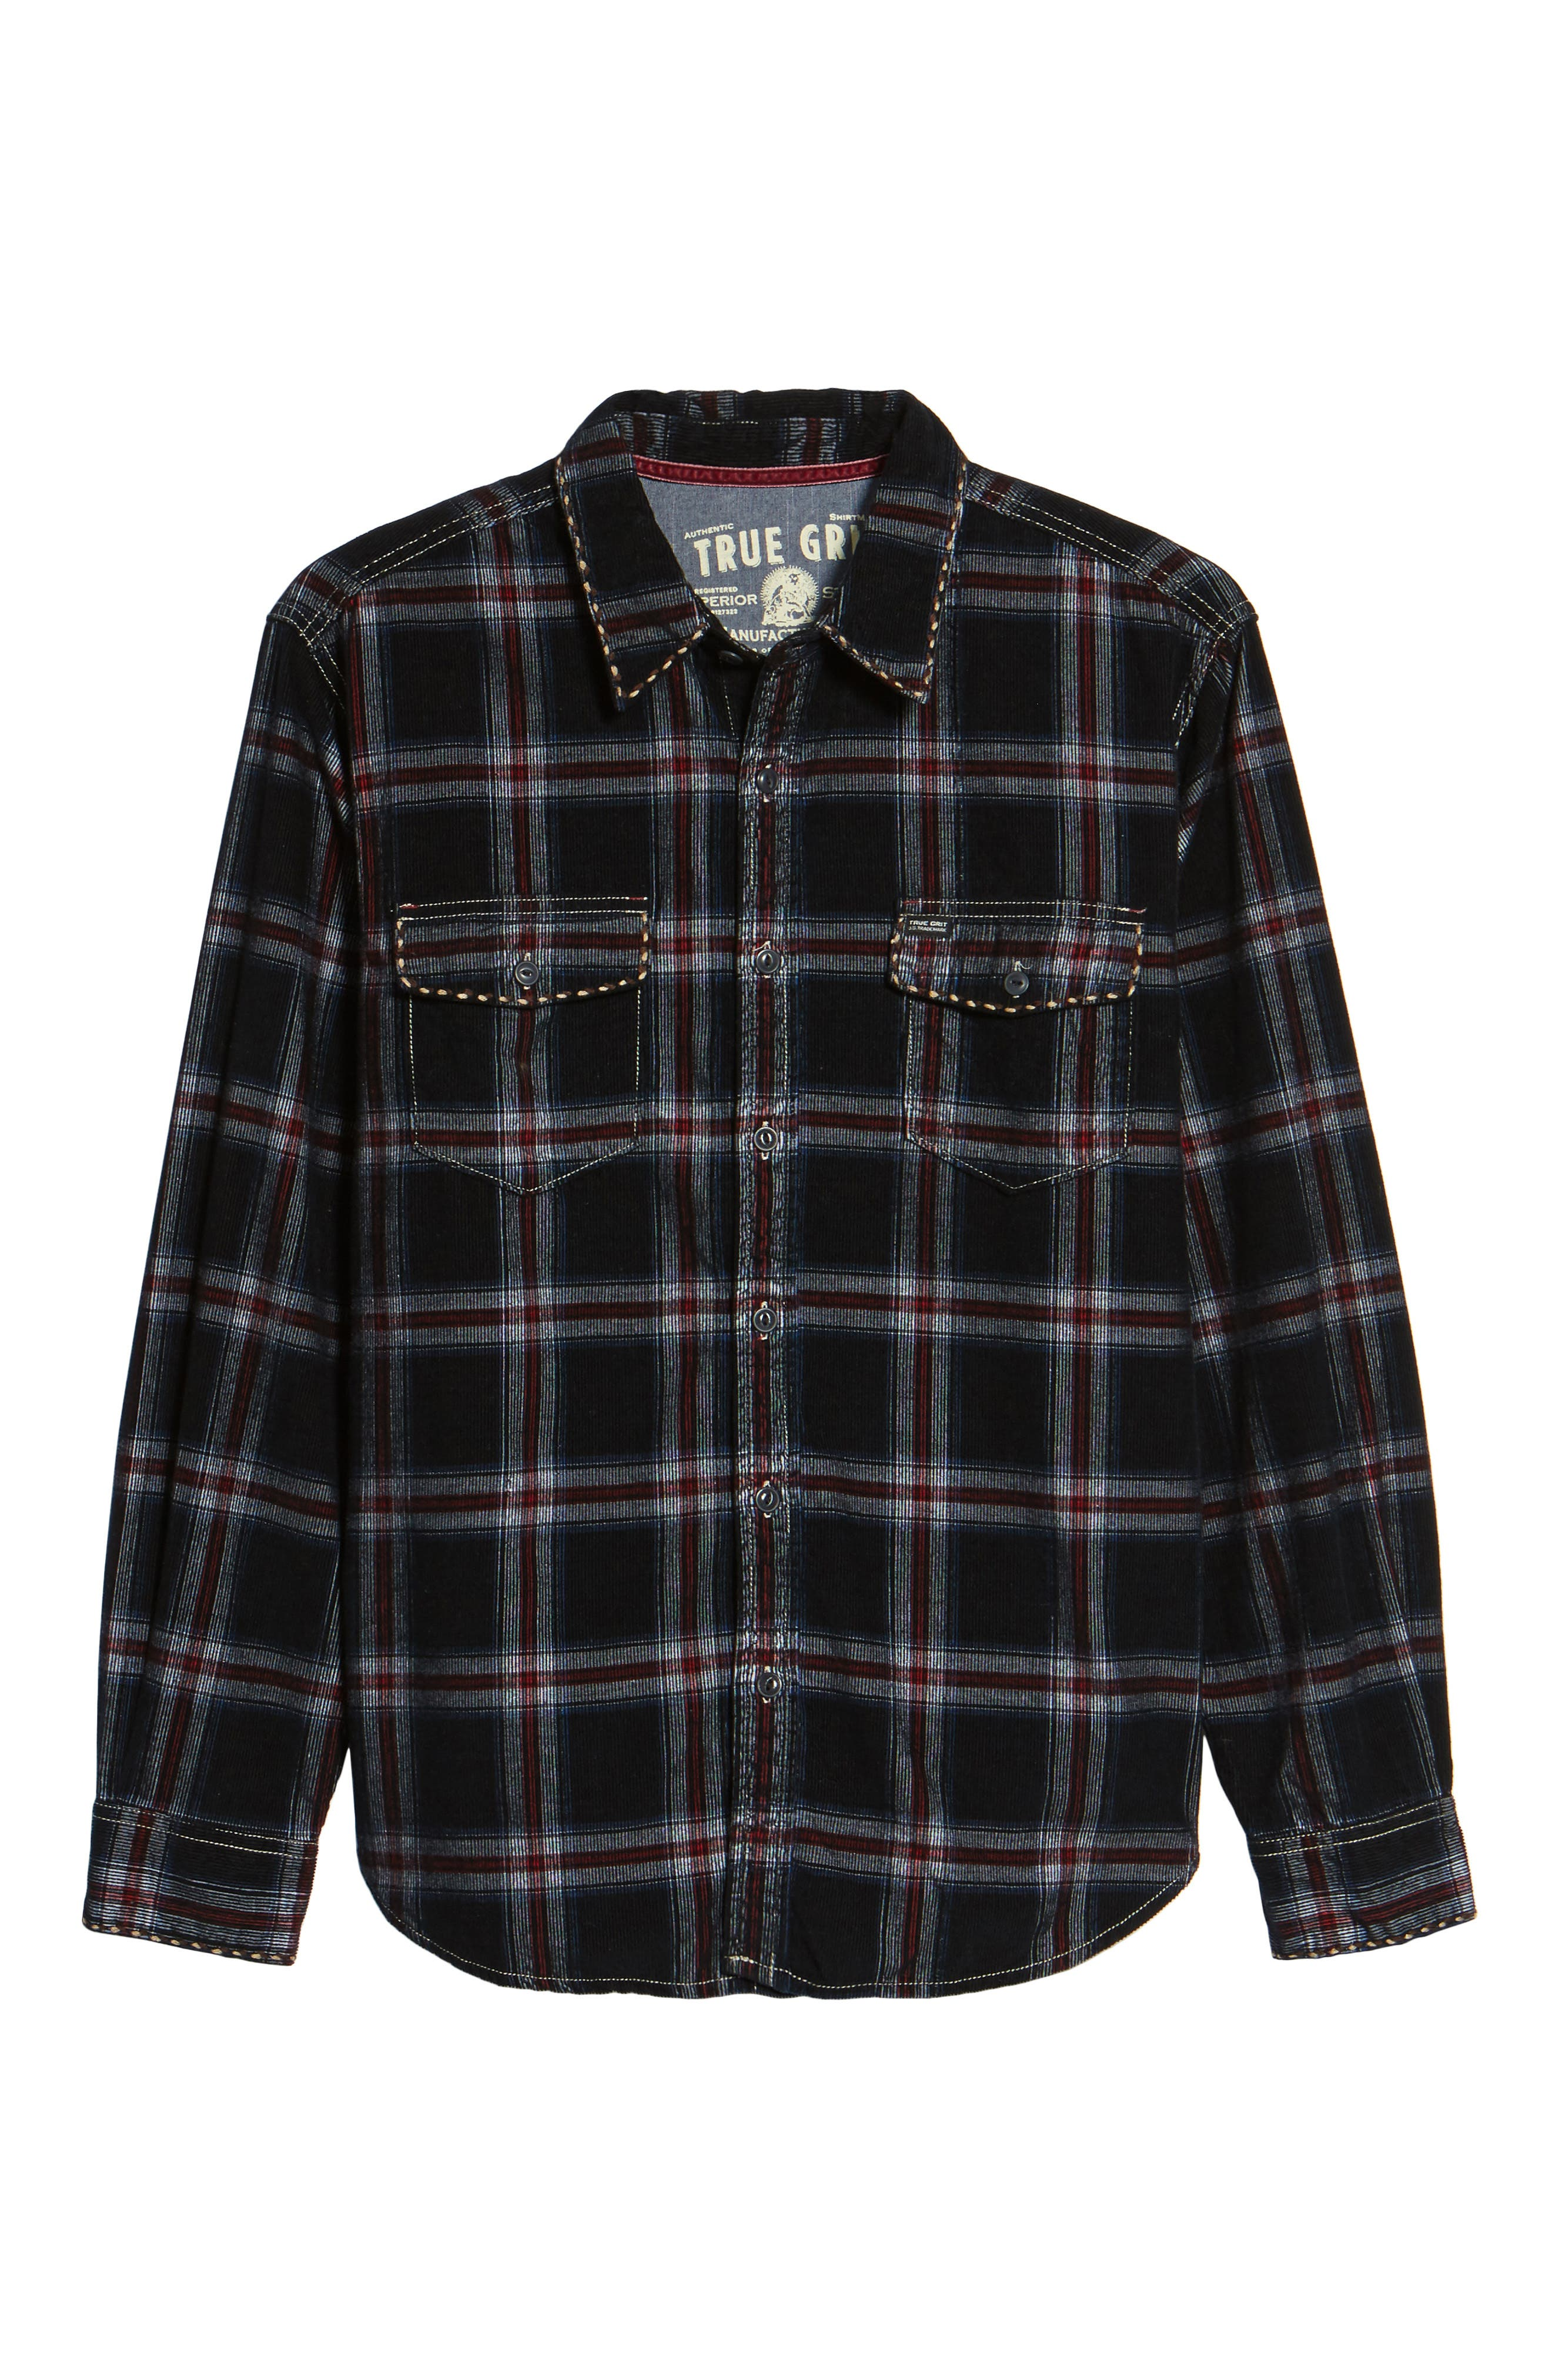 Summit Hunter Plaid Faux Shearling Lined Shirt Jacket,                             Alternate thumbnail 6, color,                             001